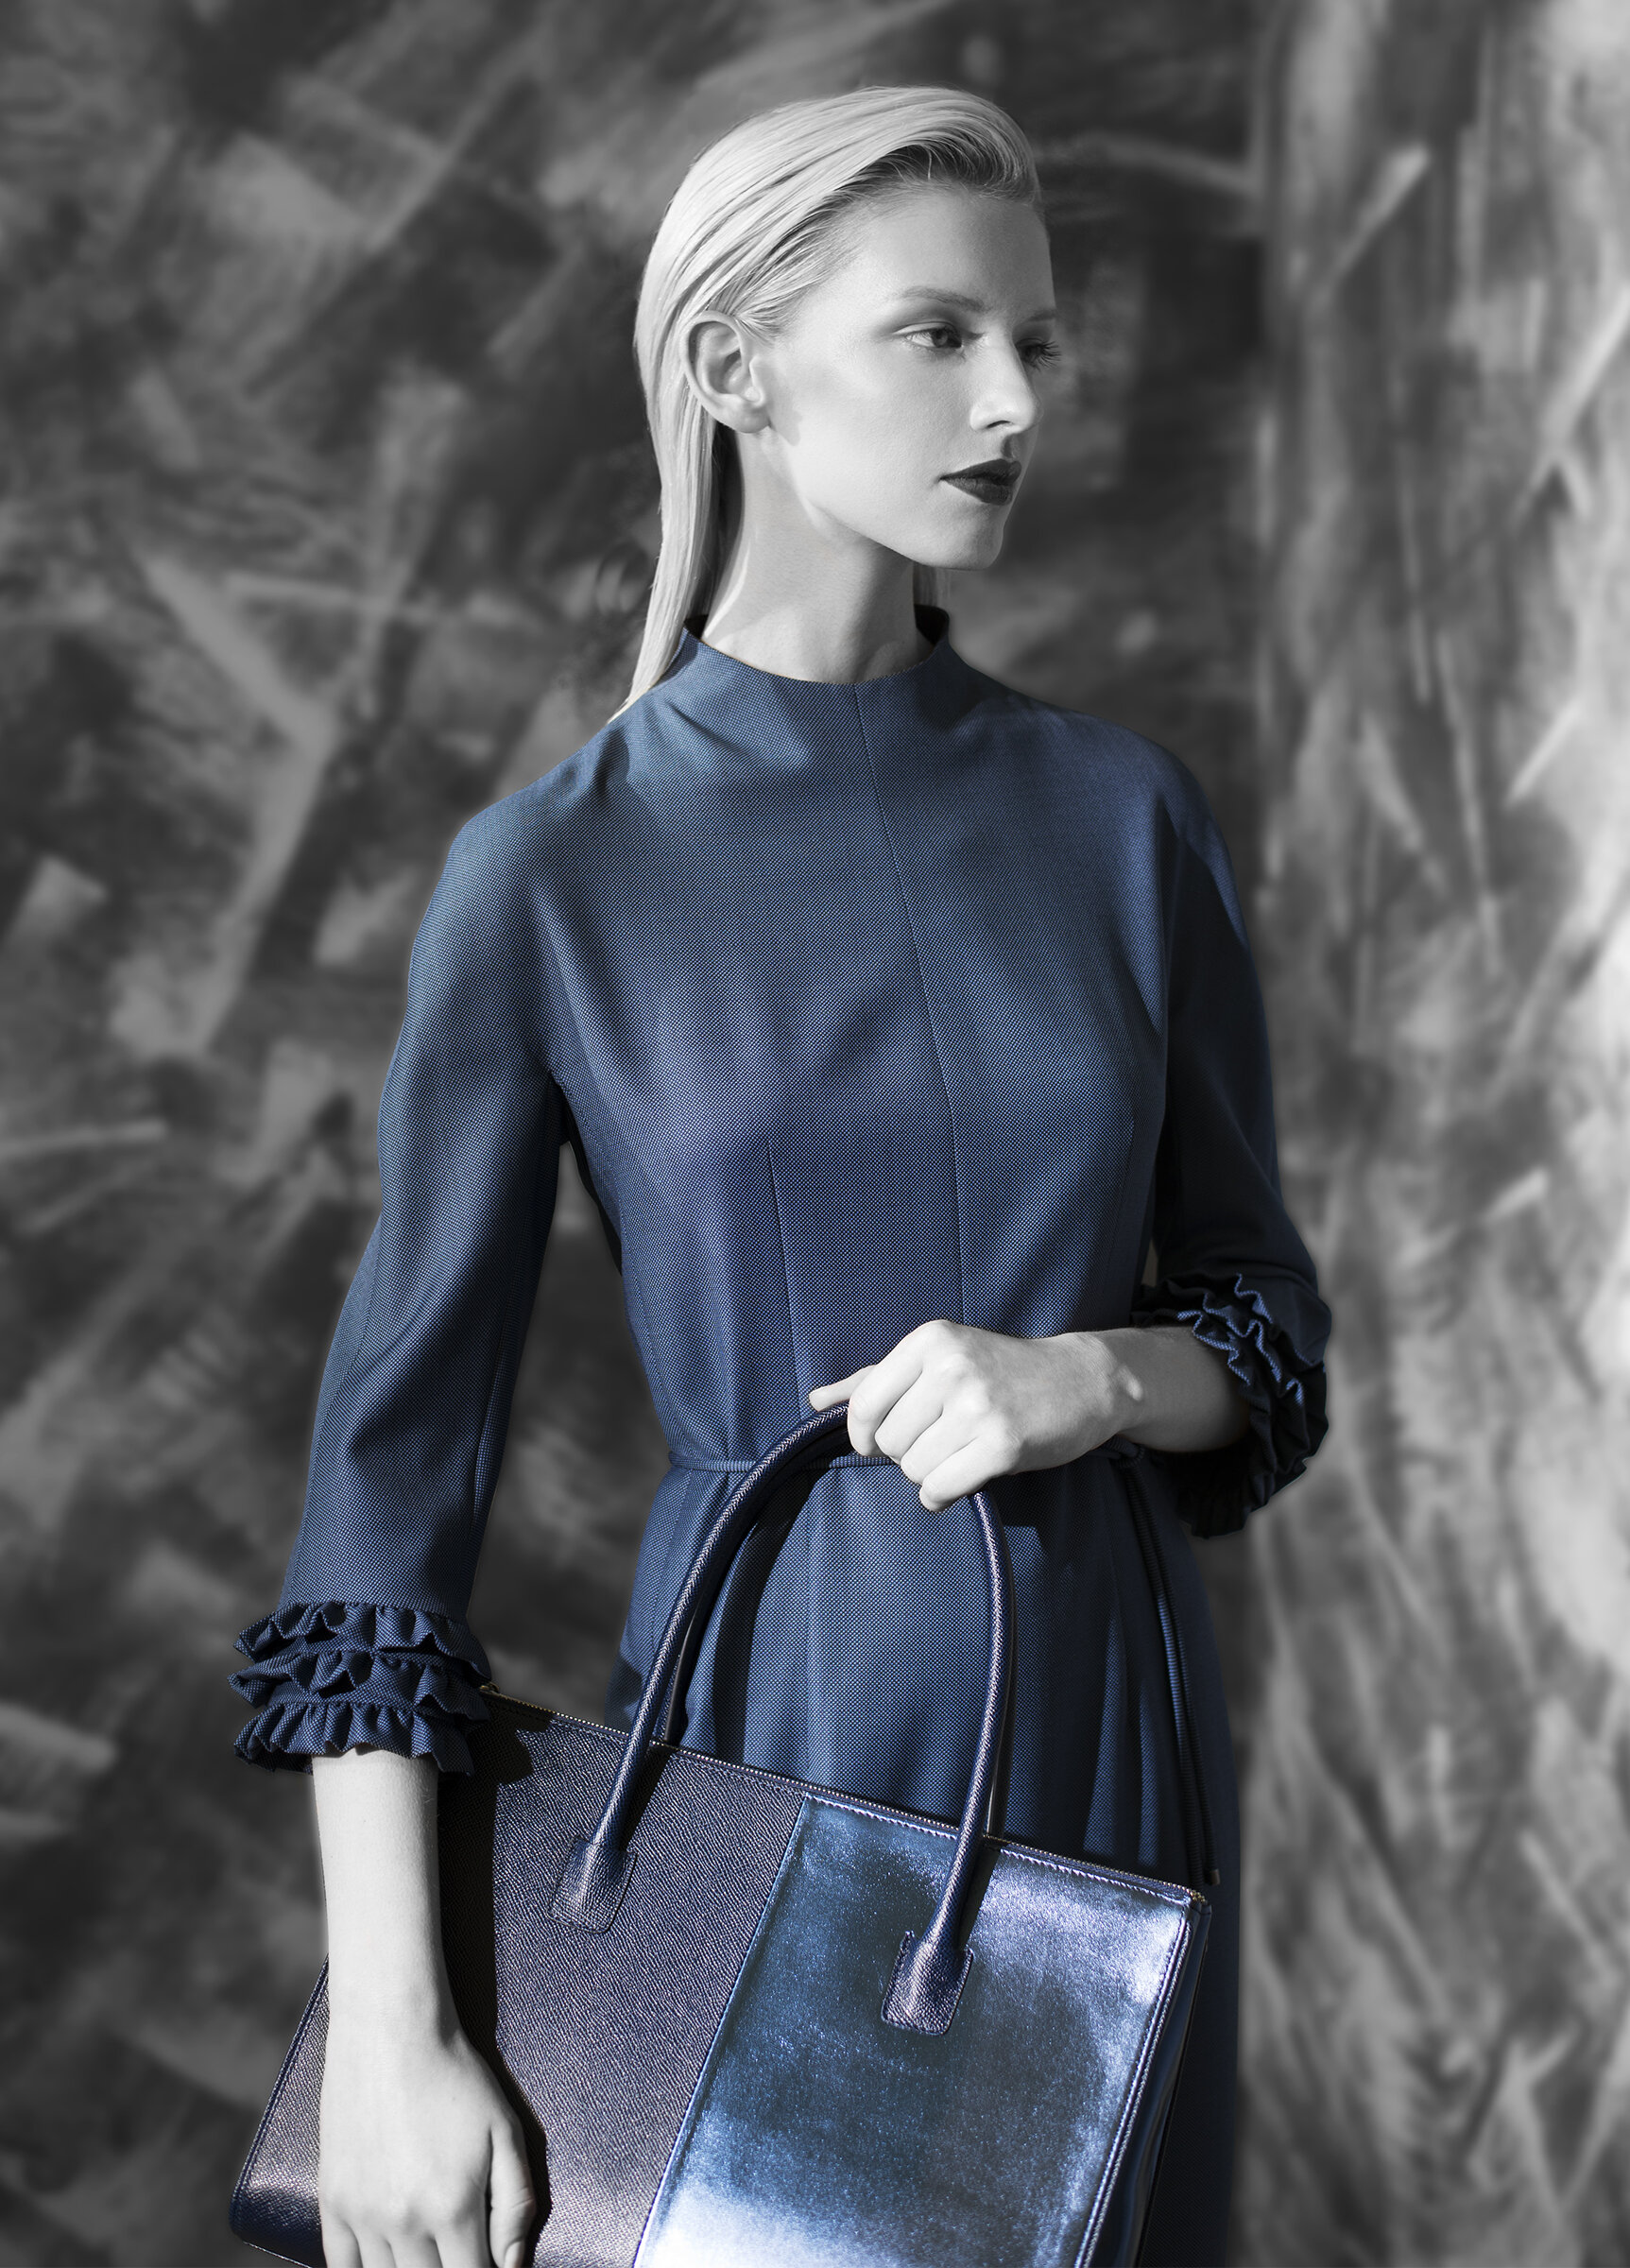 Micro geometric fine wool ruffle border dress with belt tie  opal grey graphite natural quartz venetian blue   Fine texture with metallic calf-skin bag